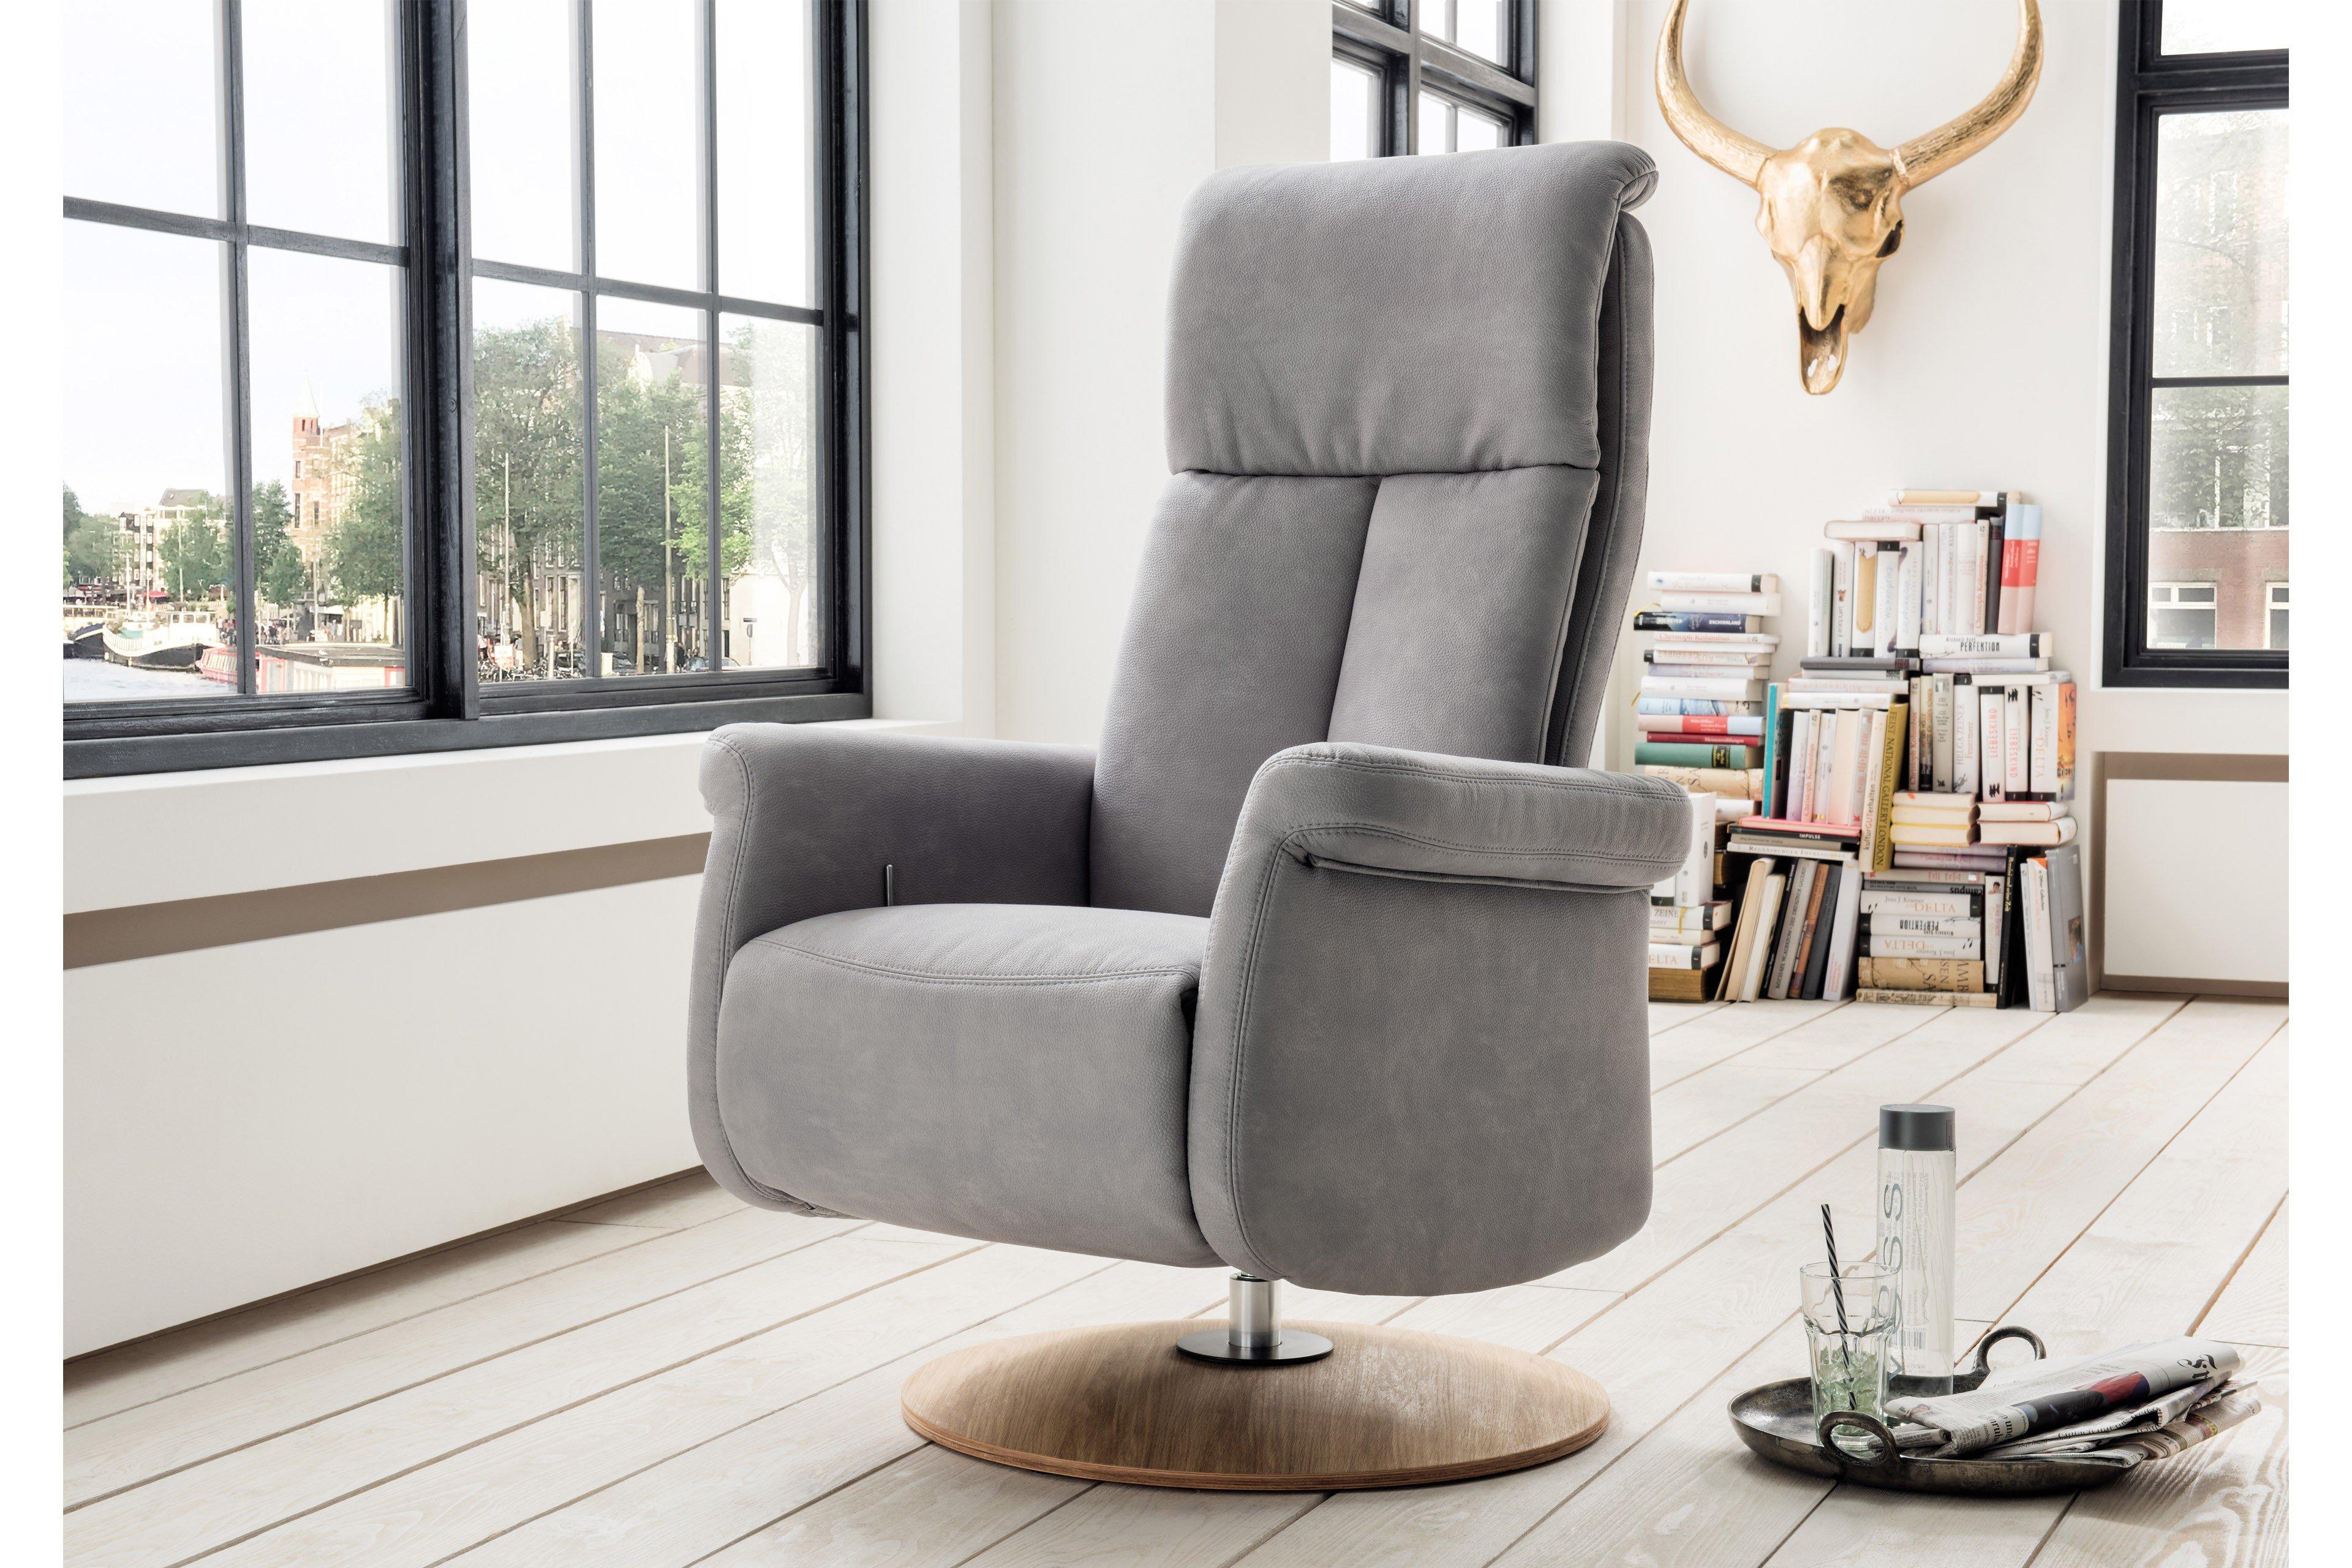 Pure Natur Relaxsessel Mobel Letz Ihr Online Shop